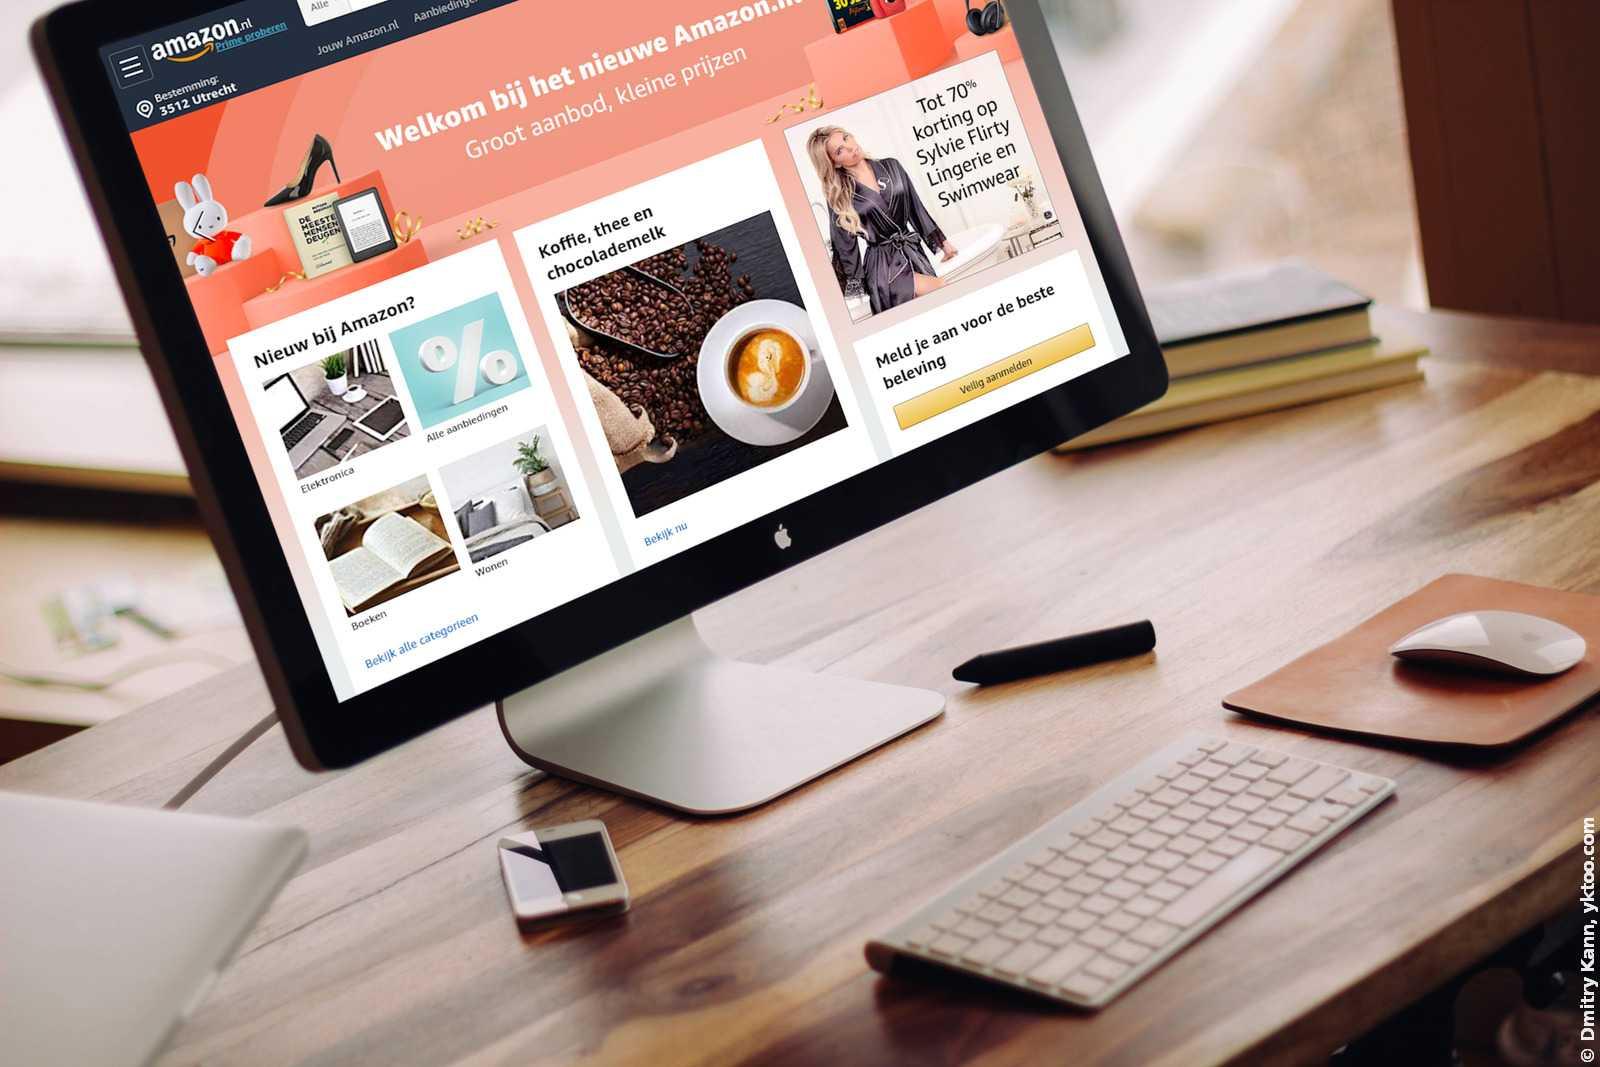 Веб-сайт нидерландского Amazon.